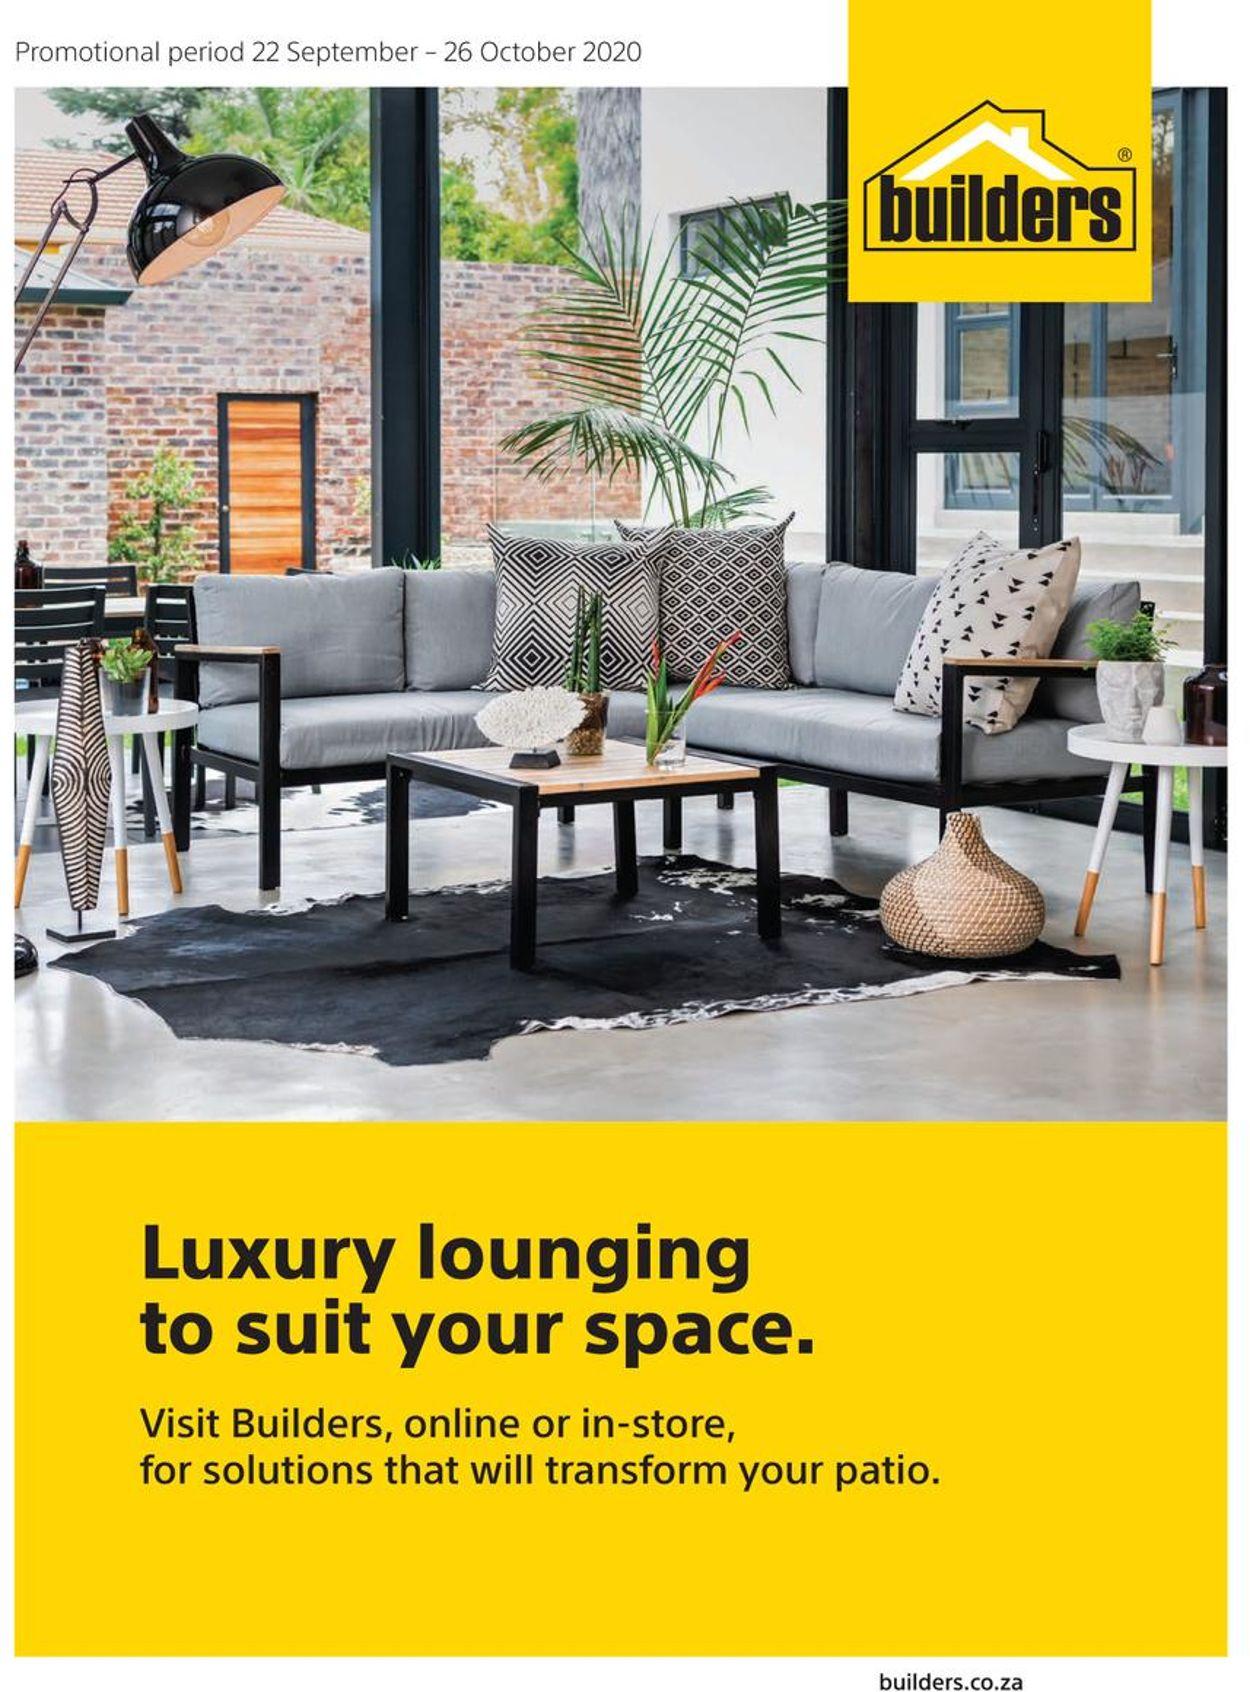 Builders Warehouse Catalogue - 2020/09/22-2020/10/26